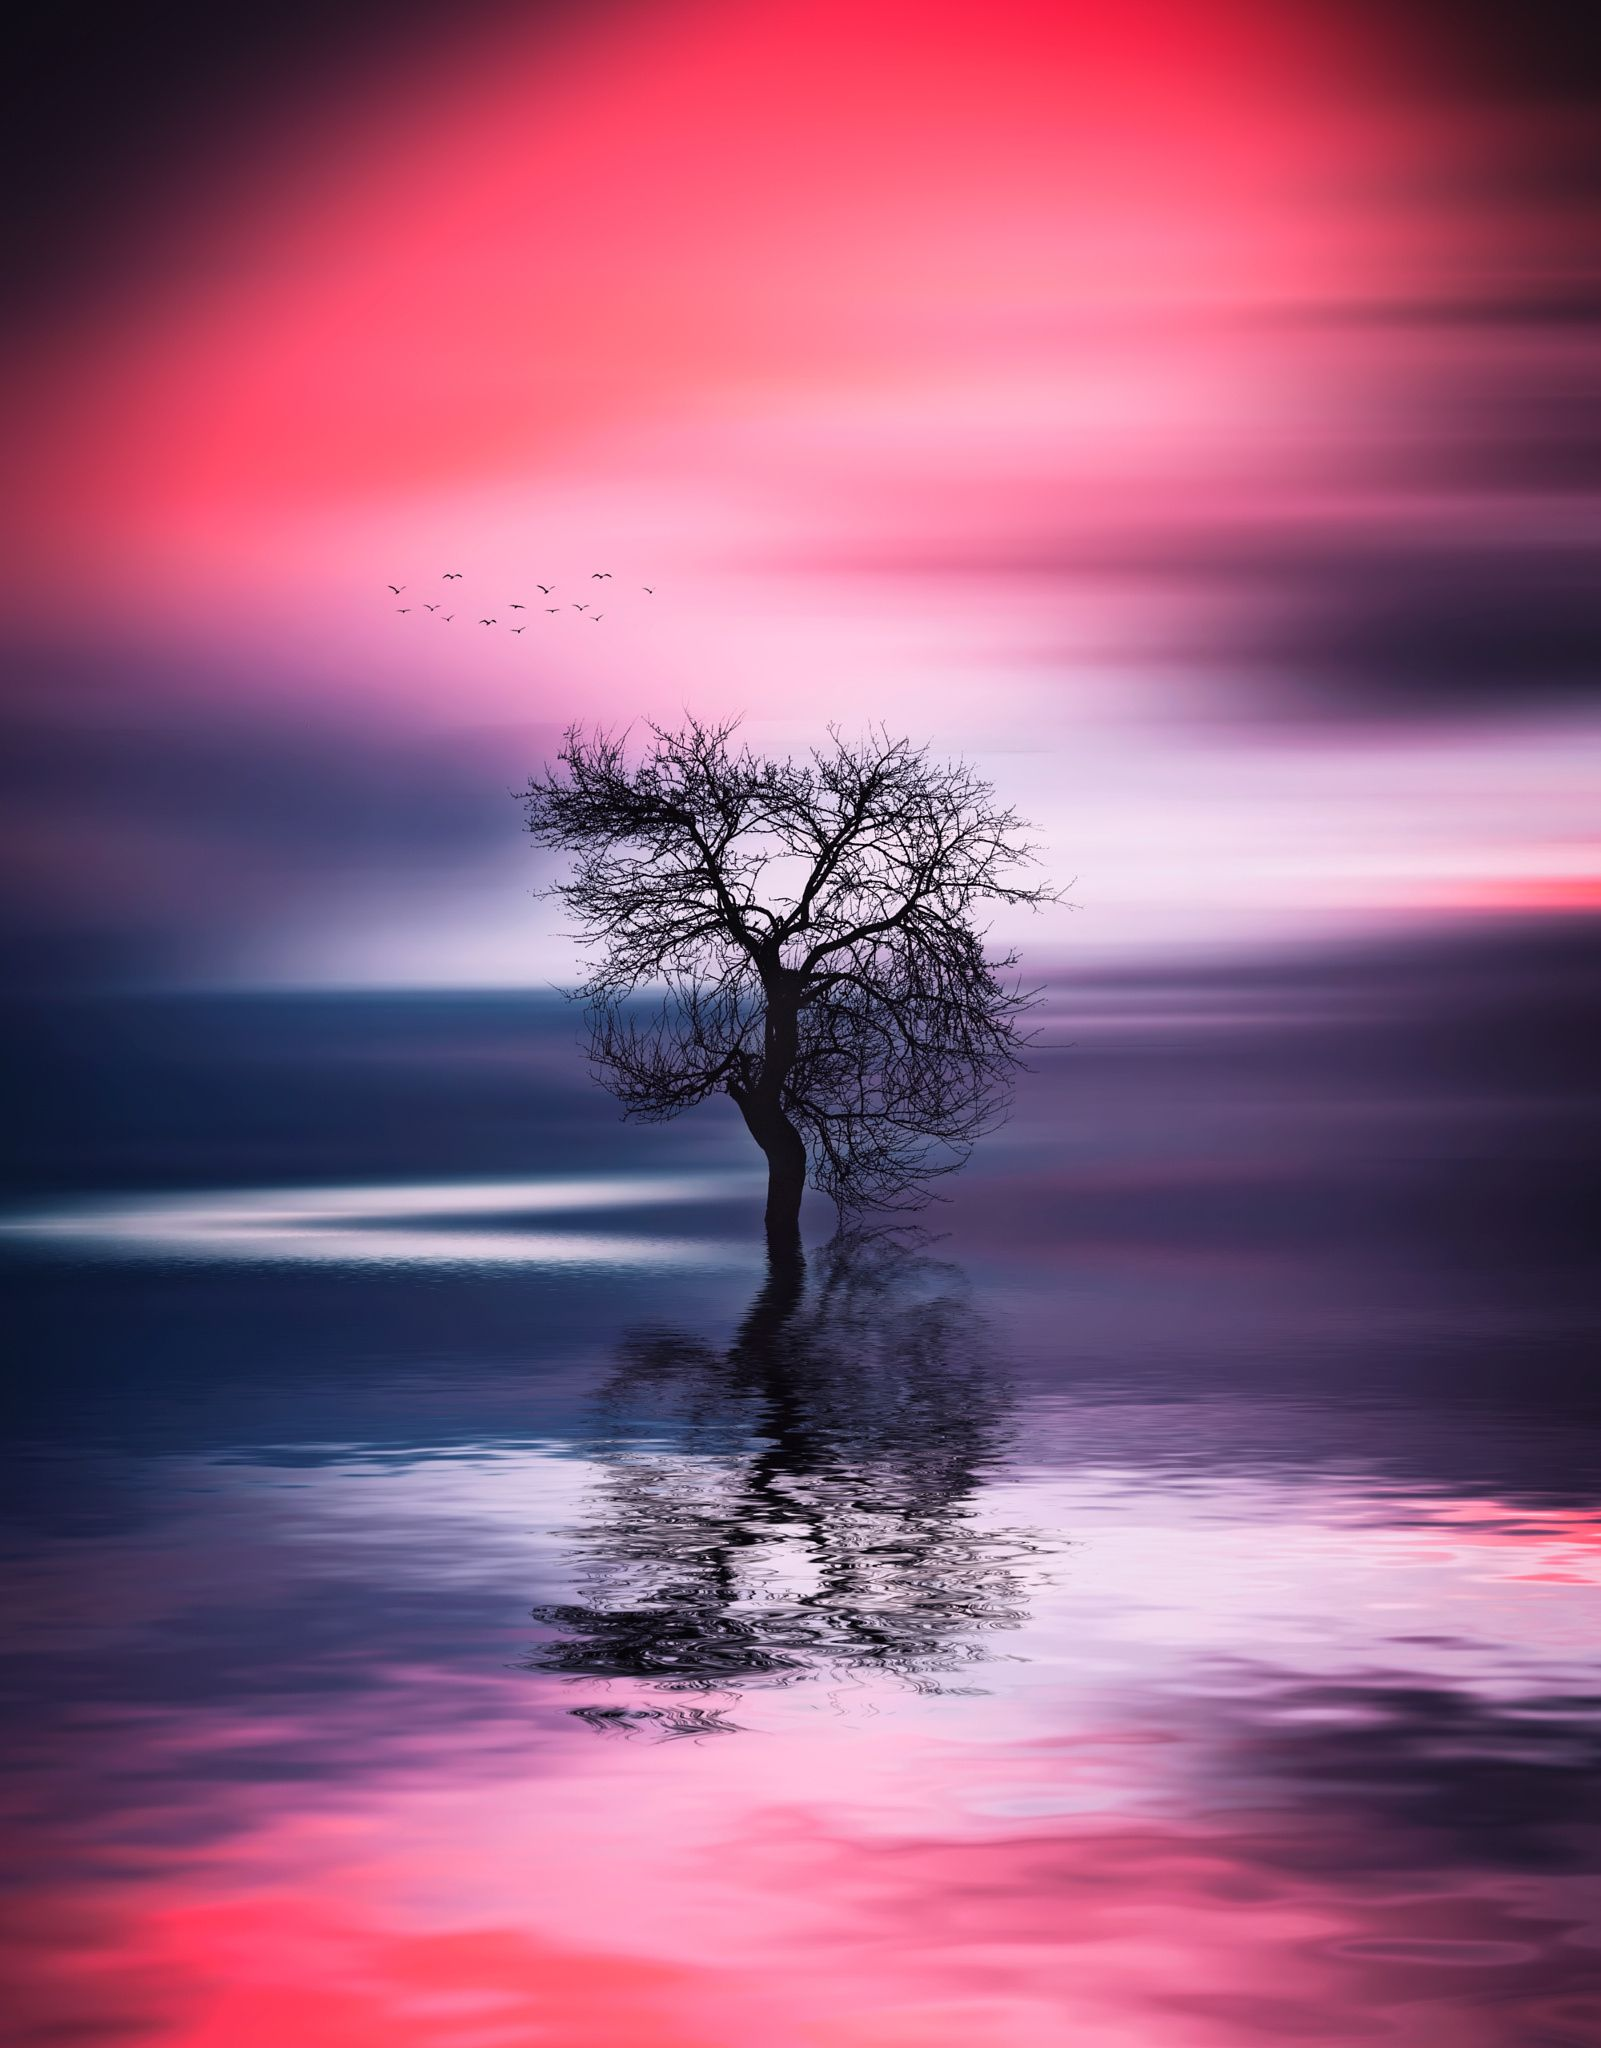 Tree in lake - http://instagram.com/bess_hamiti/  https://www.facebook.com/044555323bessi https://500px.com/Besmir  https://twitter.com/BessiHamiti7